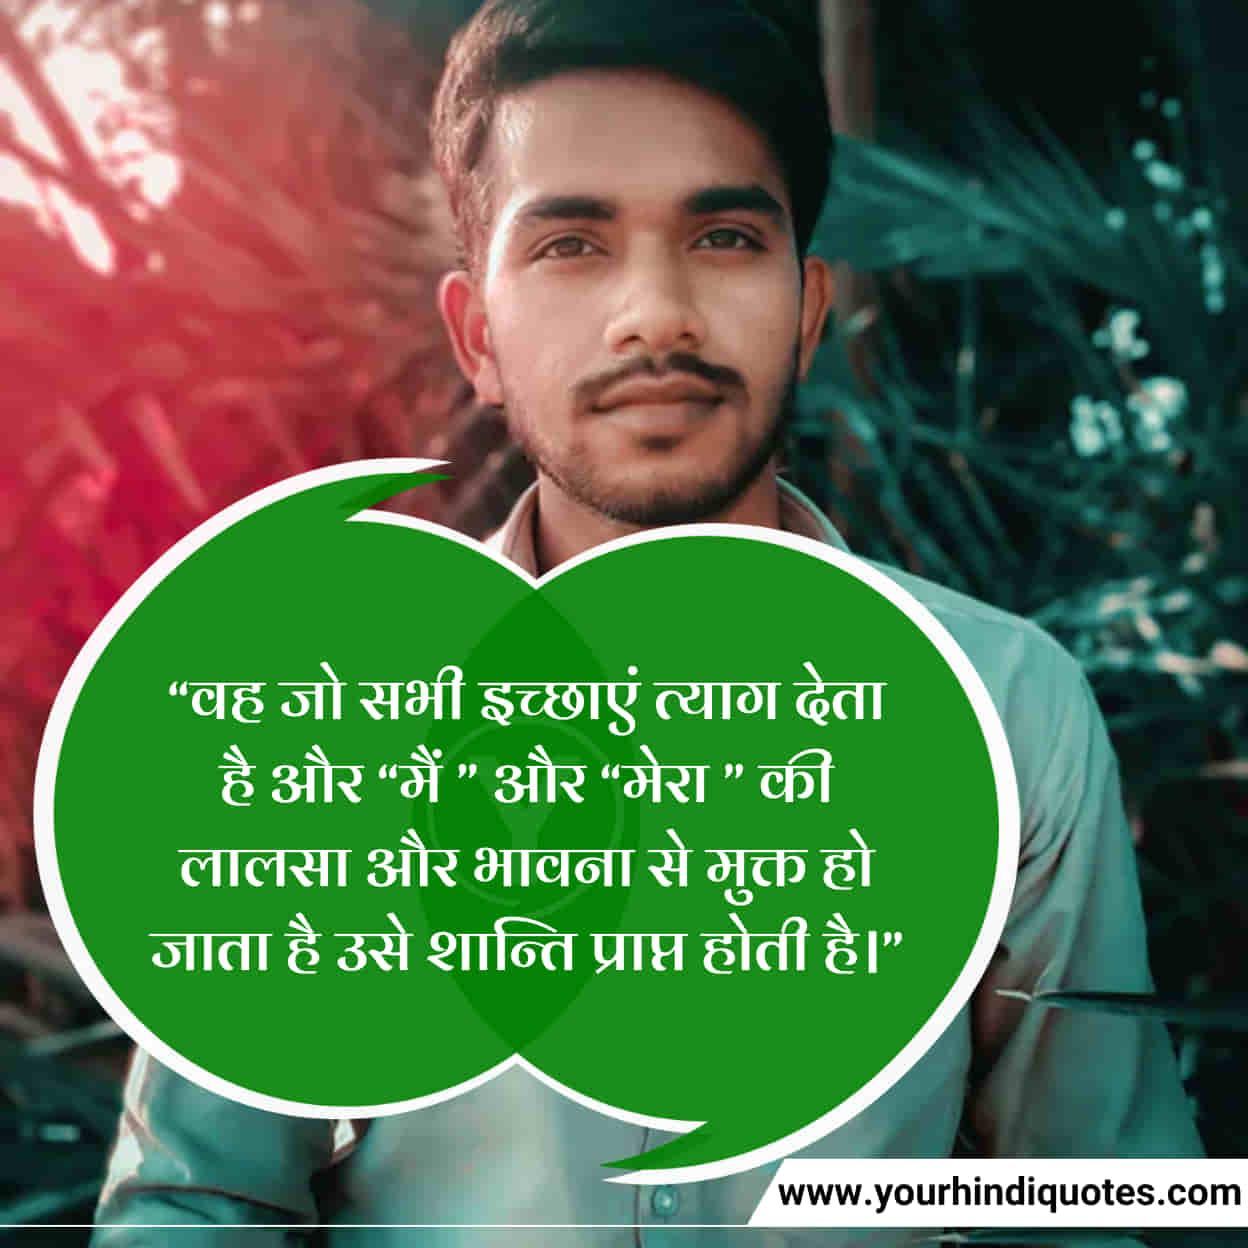 Bhagwat Gita Quotes in Hindi